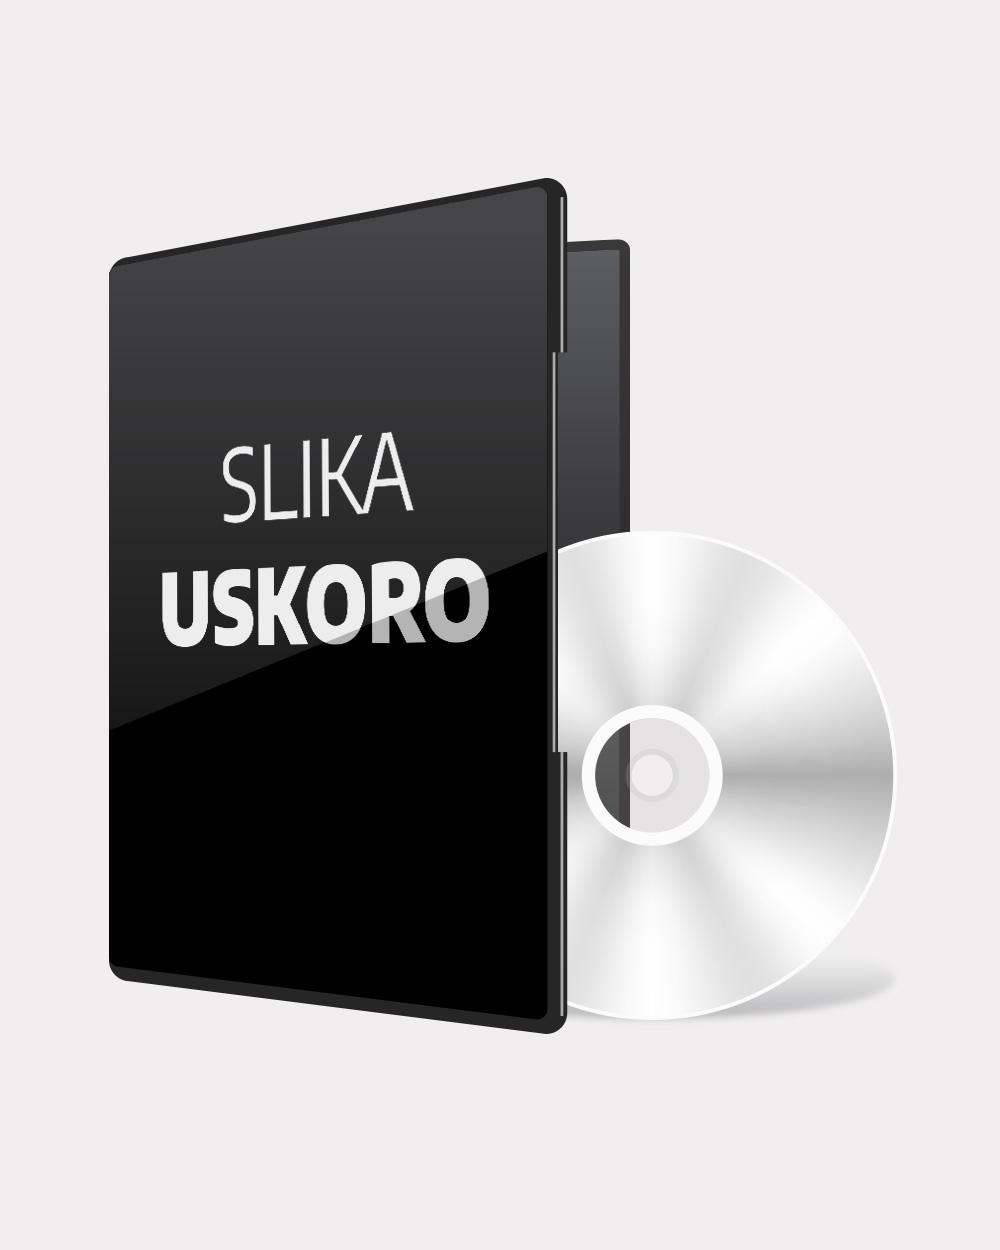 Slušalice Xipin Metal In-ear Headset HX-730 Black